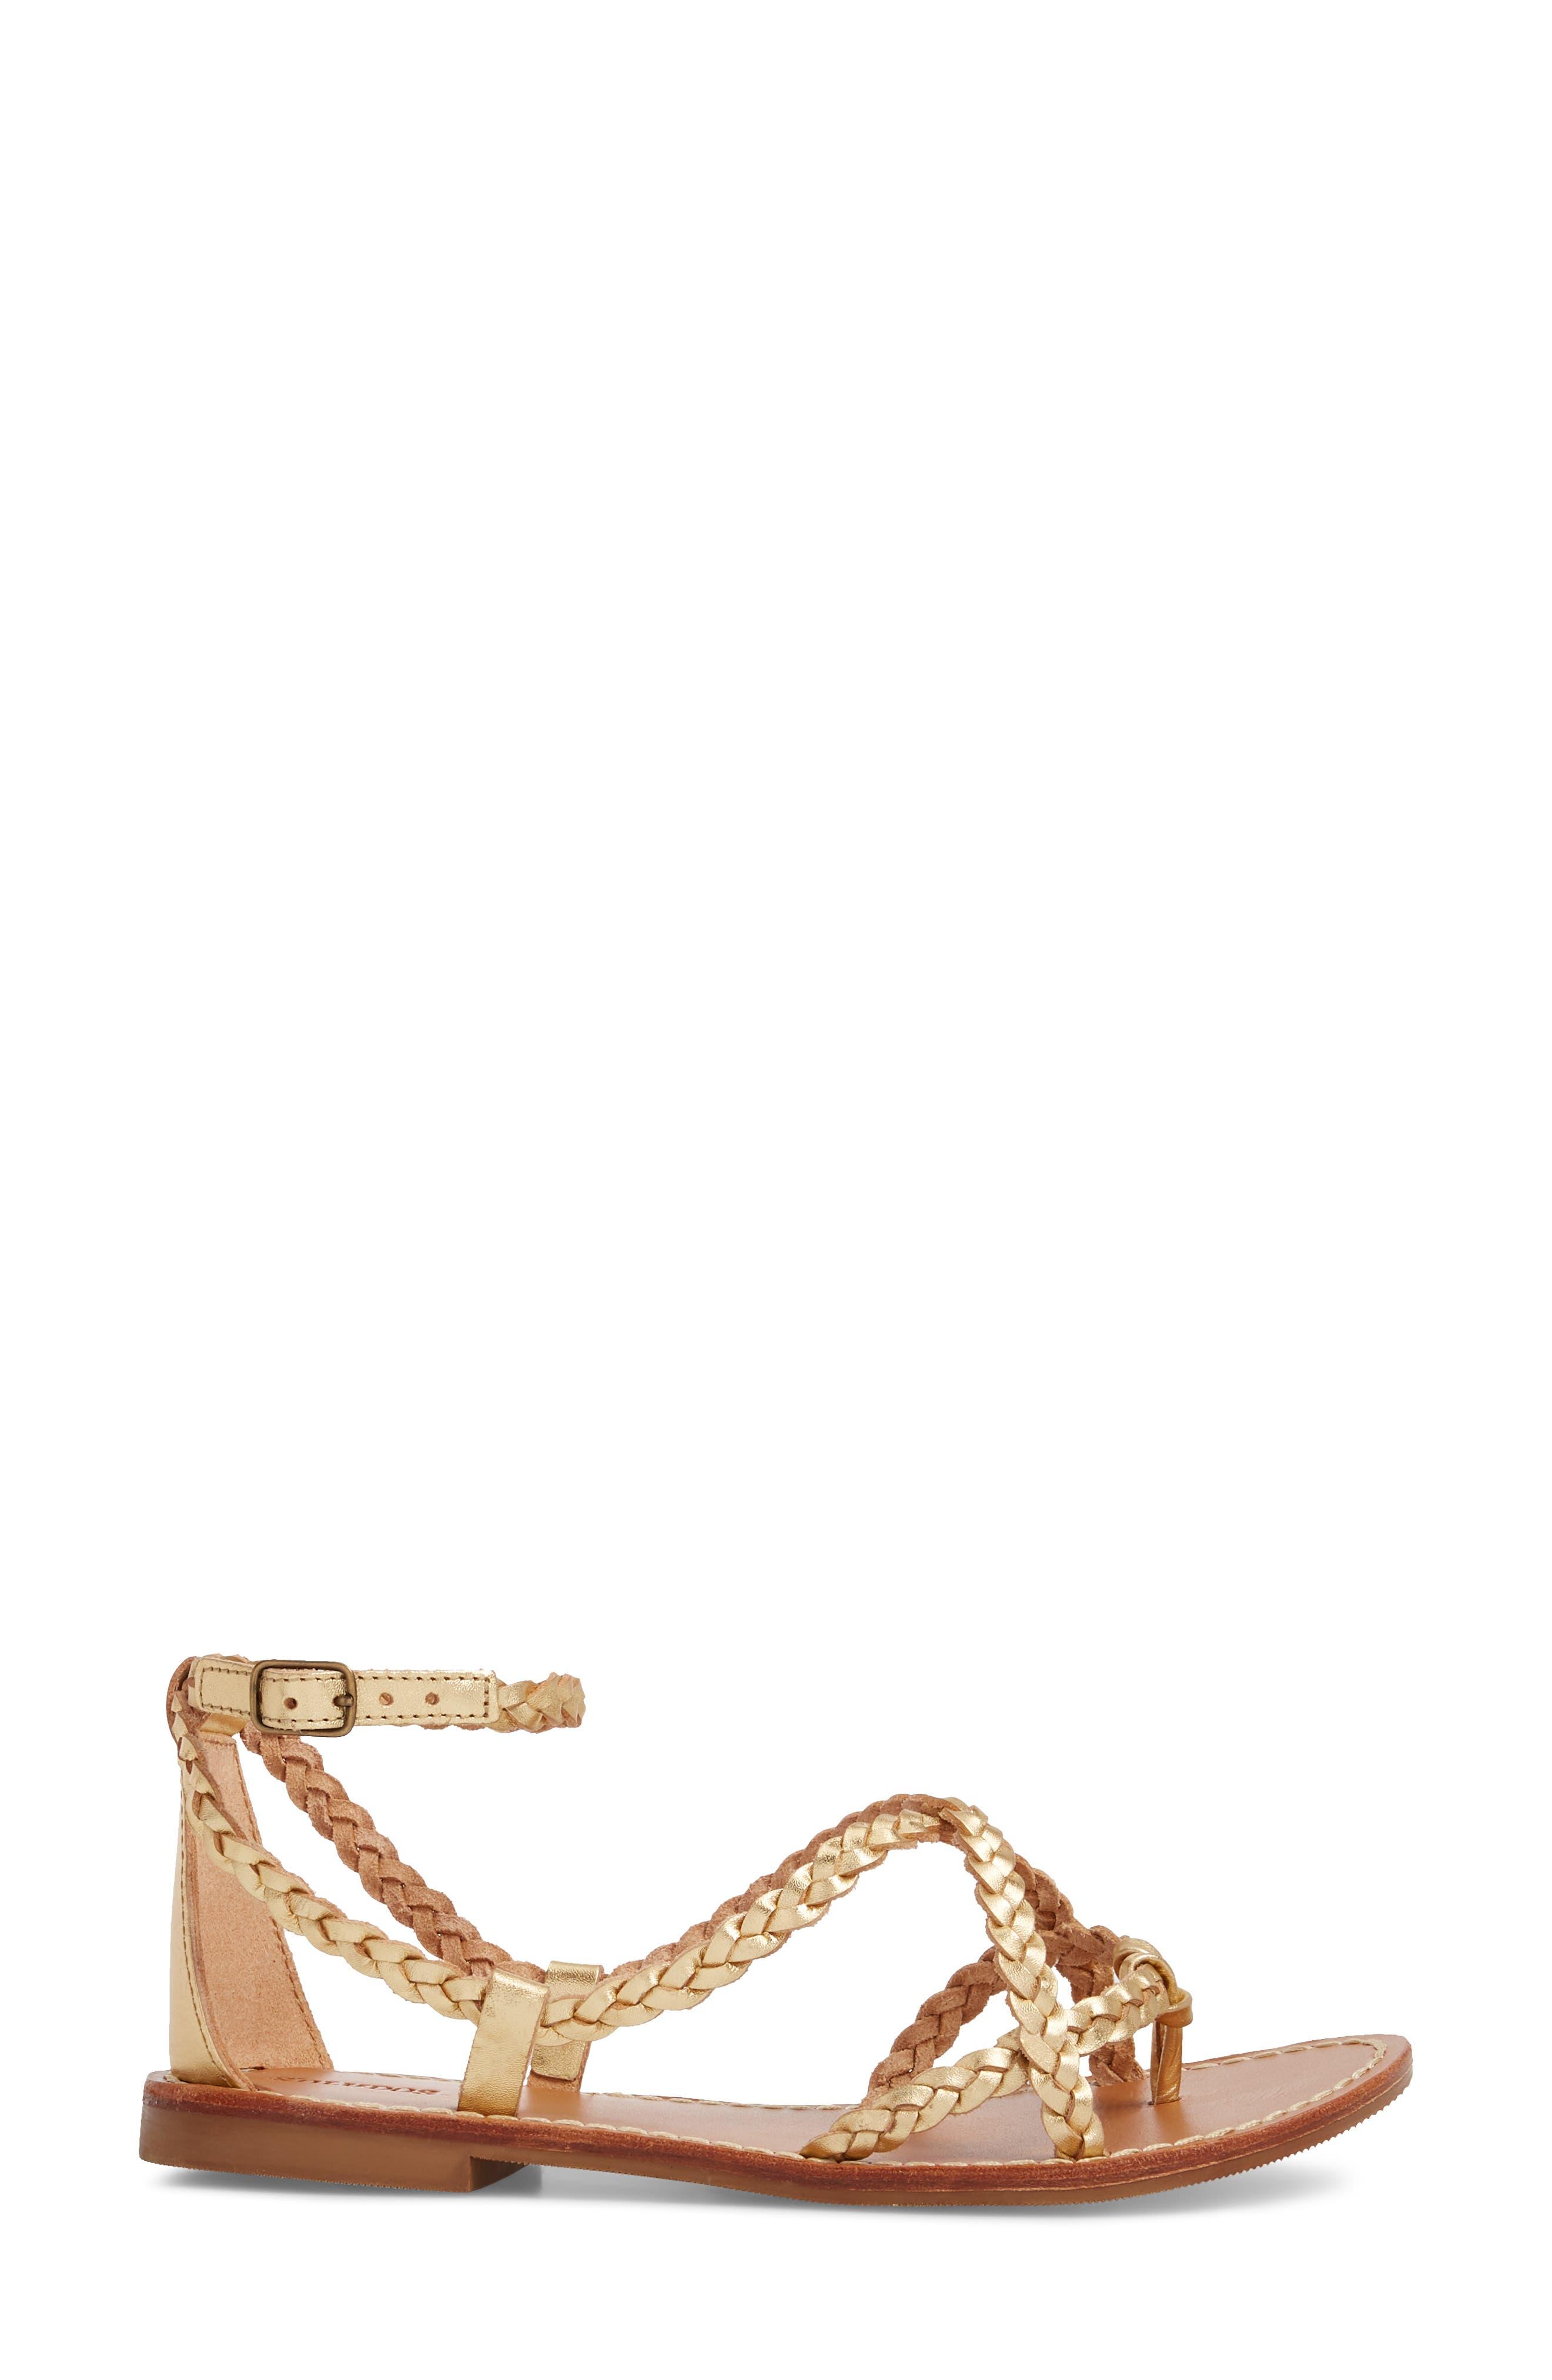 Amalfi Braided Metallic Sandal,                             Alternate thumbnail 3, color,                             710